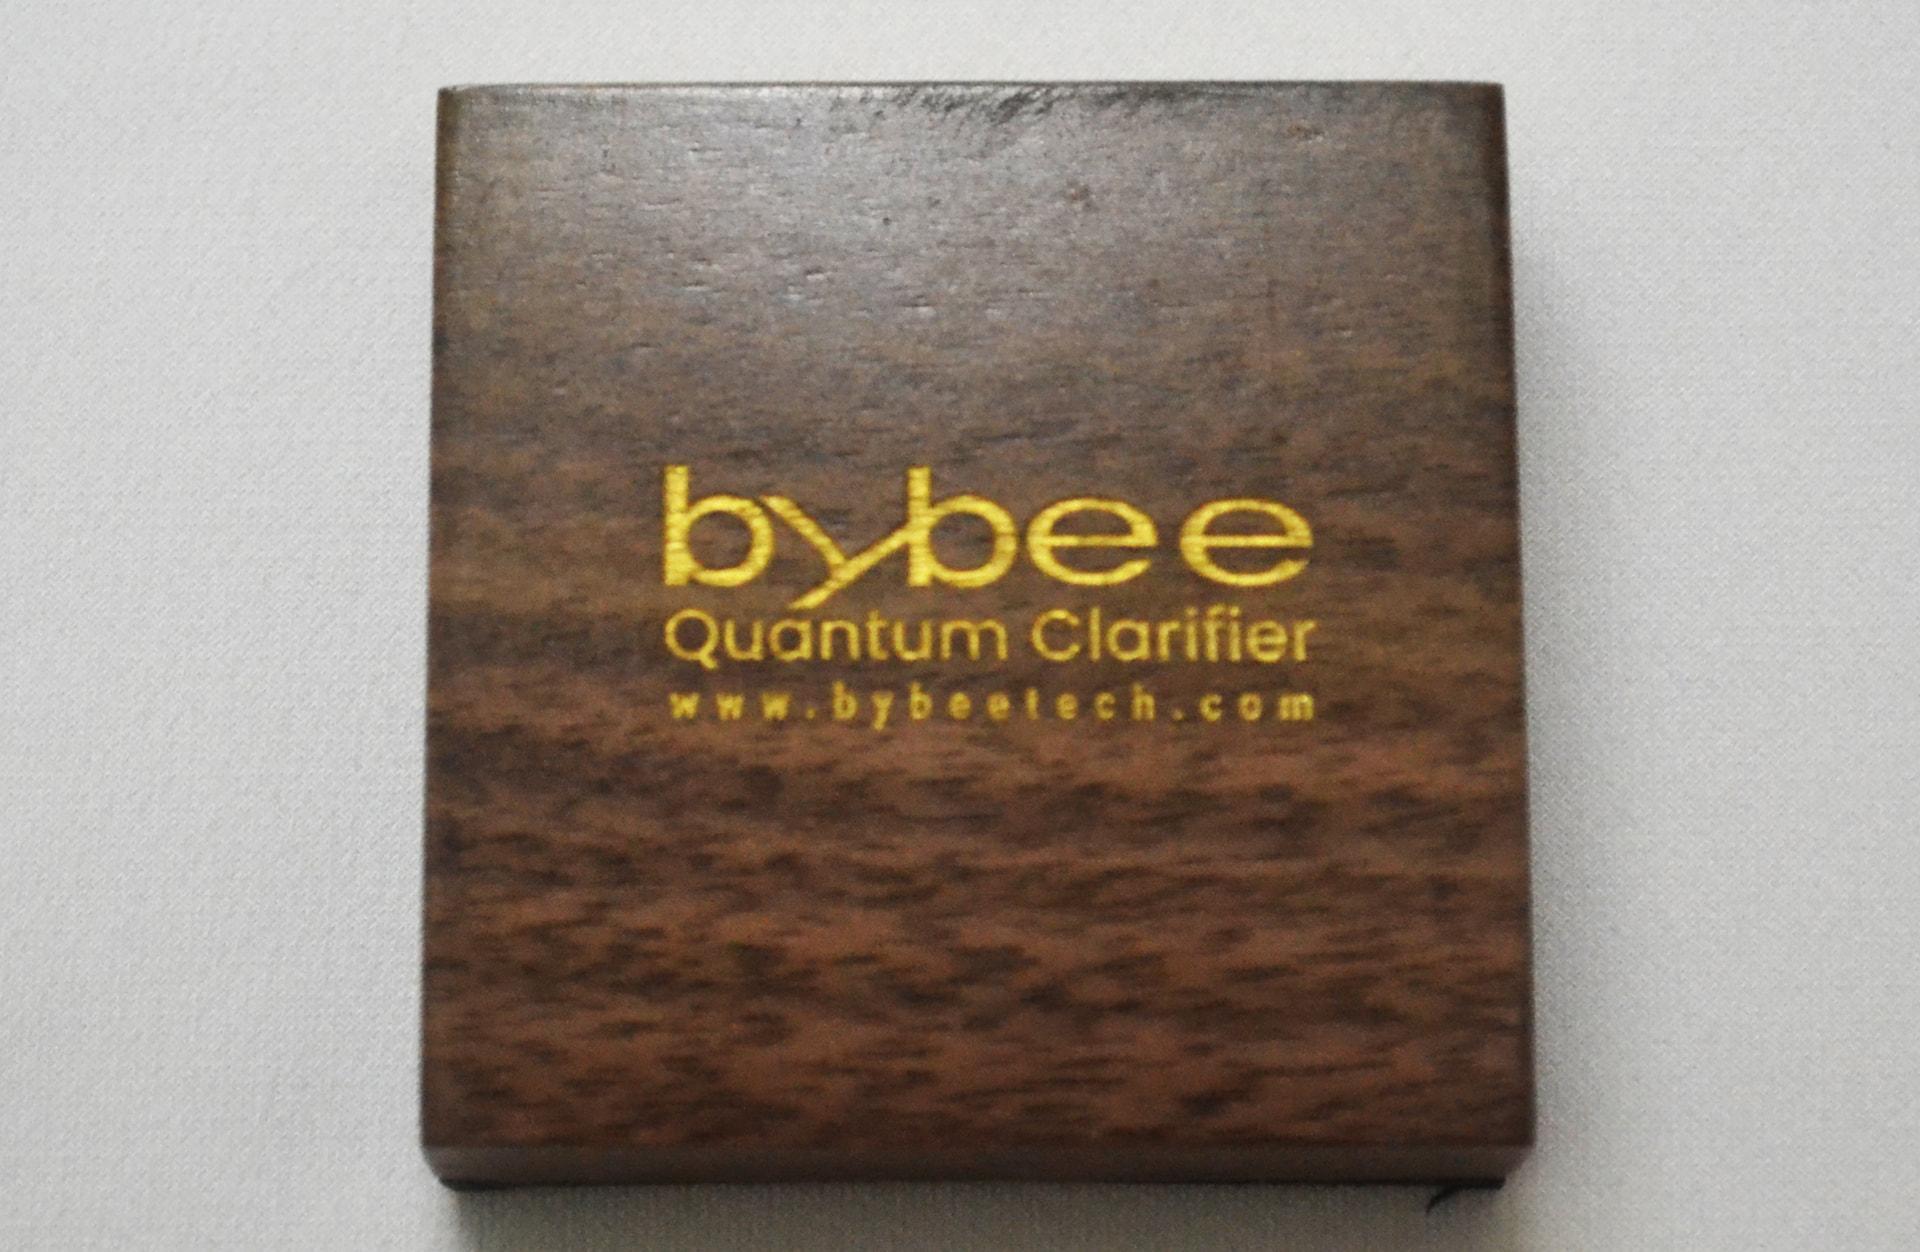 Bybee Quantum Clarifier_1